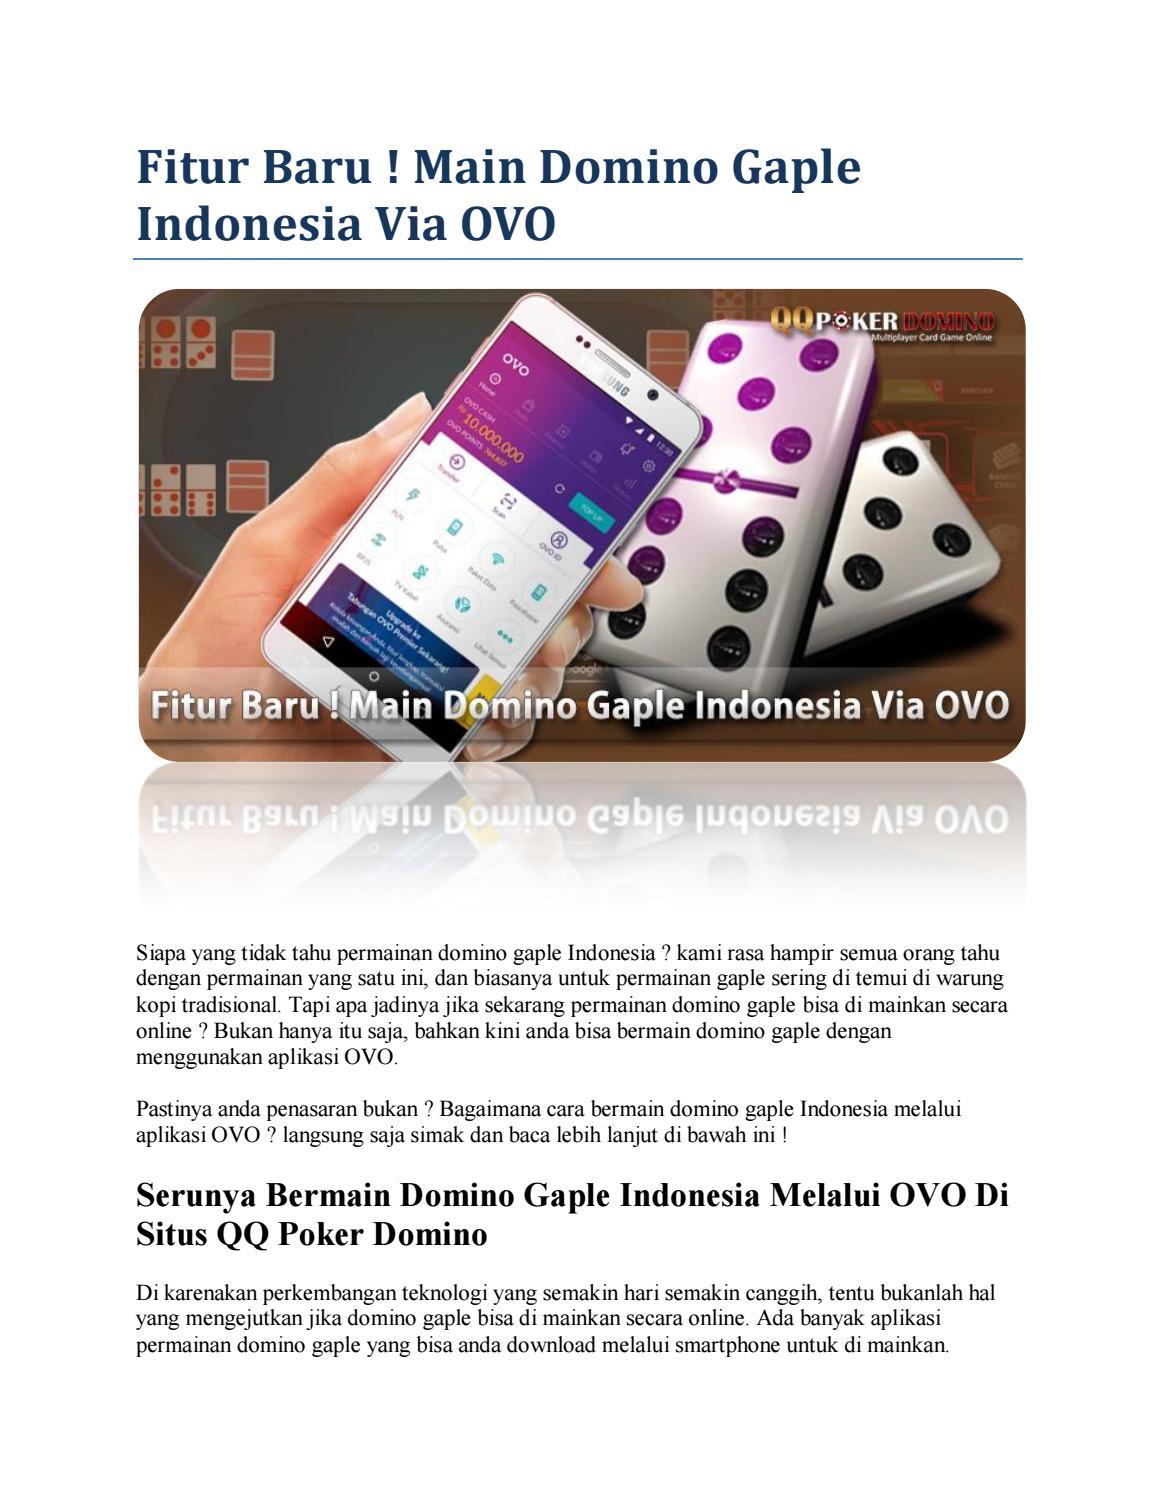 Fitur Baru Main Domino Gaple Indonesia Via Ovo By Anan Issuu